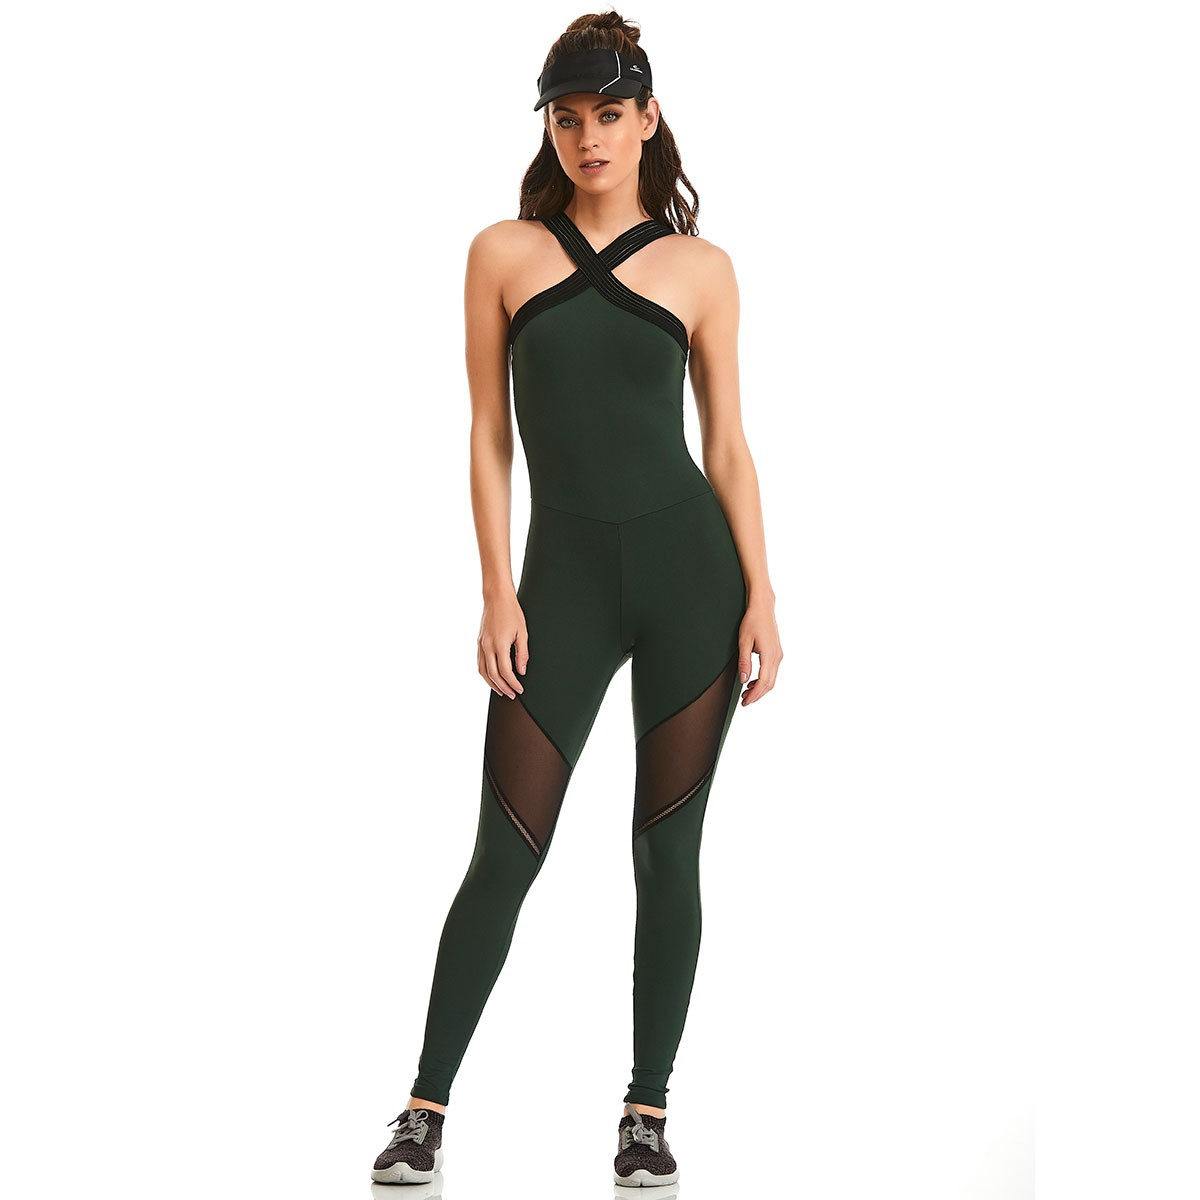 Macacão NZ Bojo Future Verde CAJUBRASIL Activewear